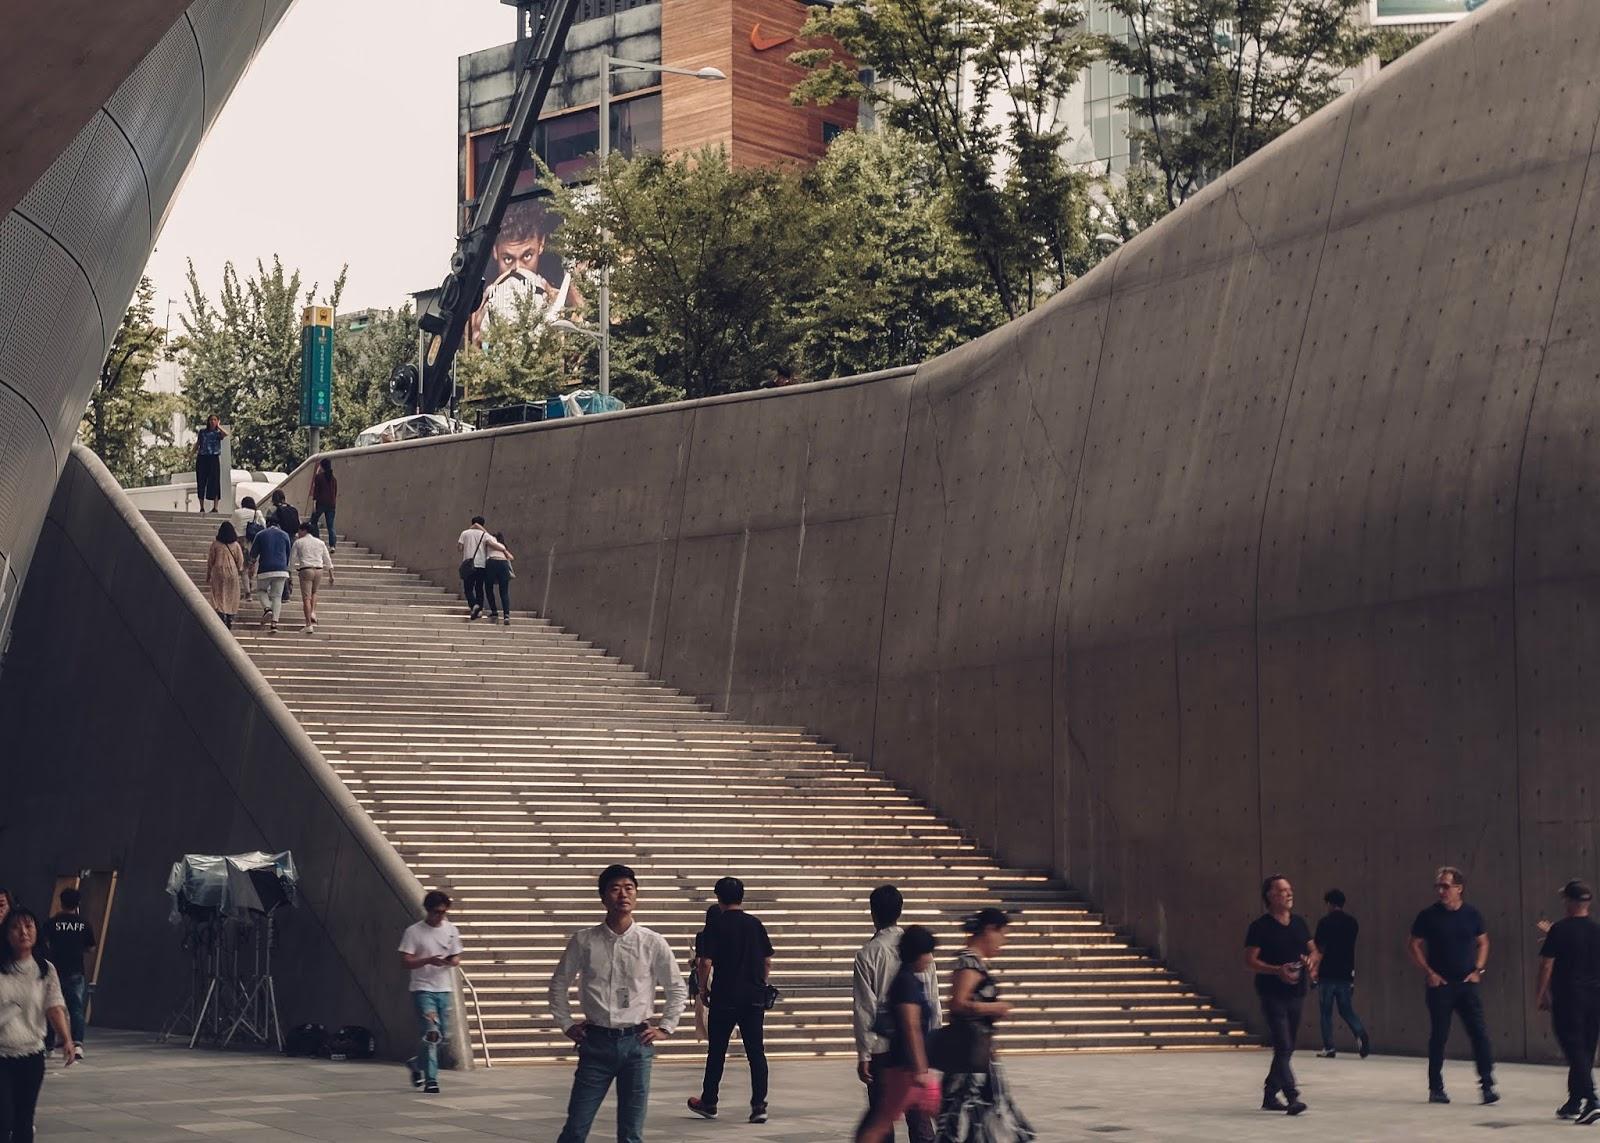 Dongadaemun Plaza Seoul Korea Curitan Aqalili